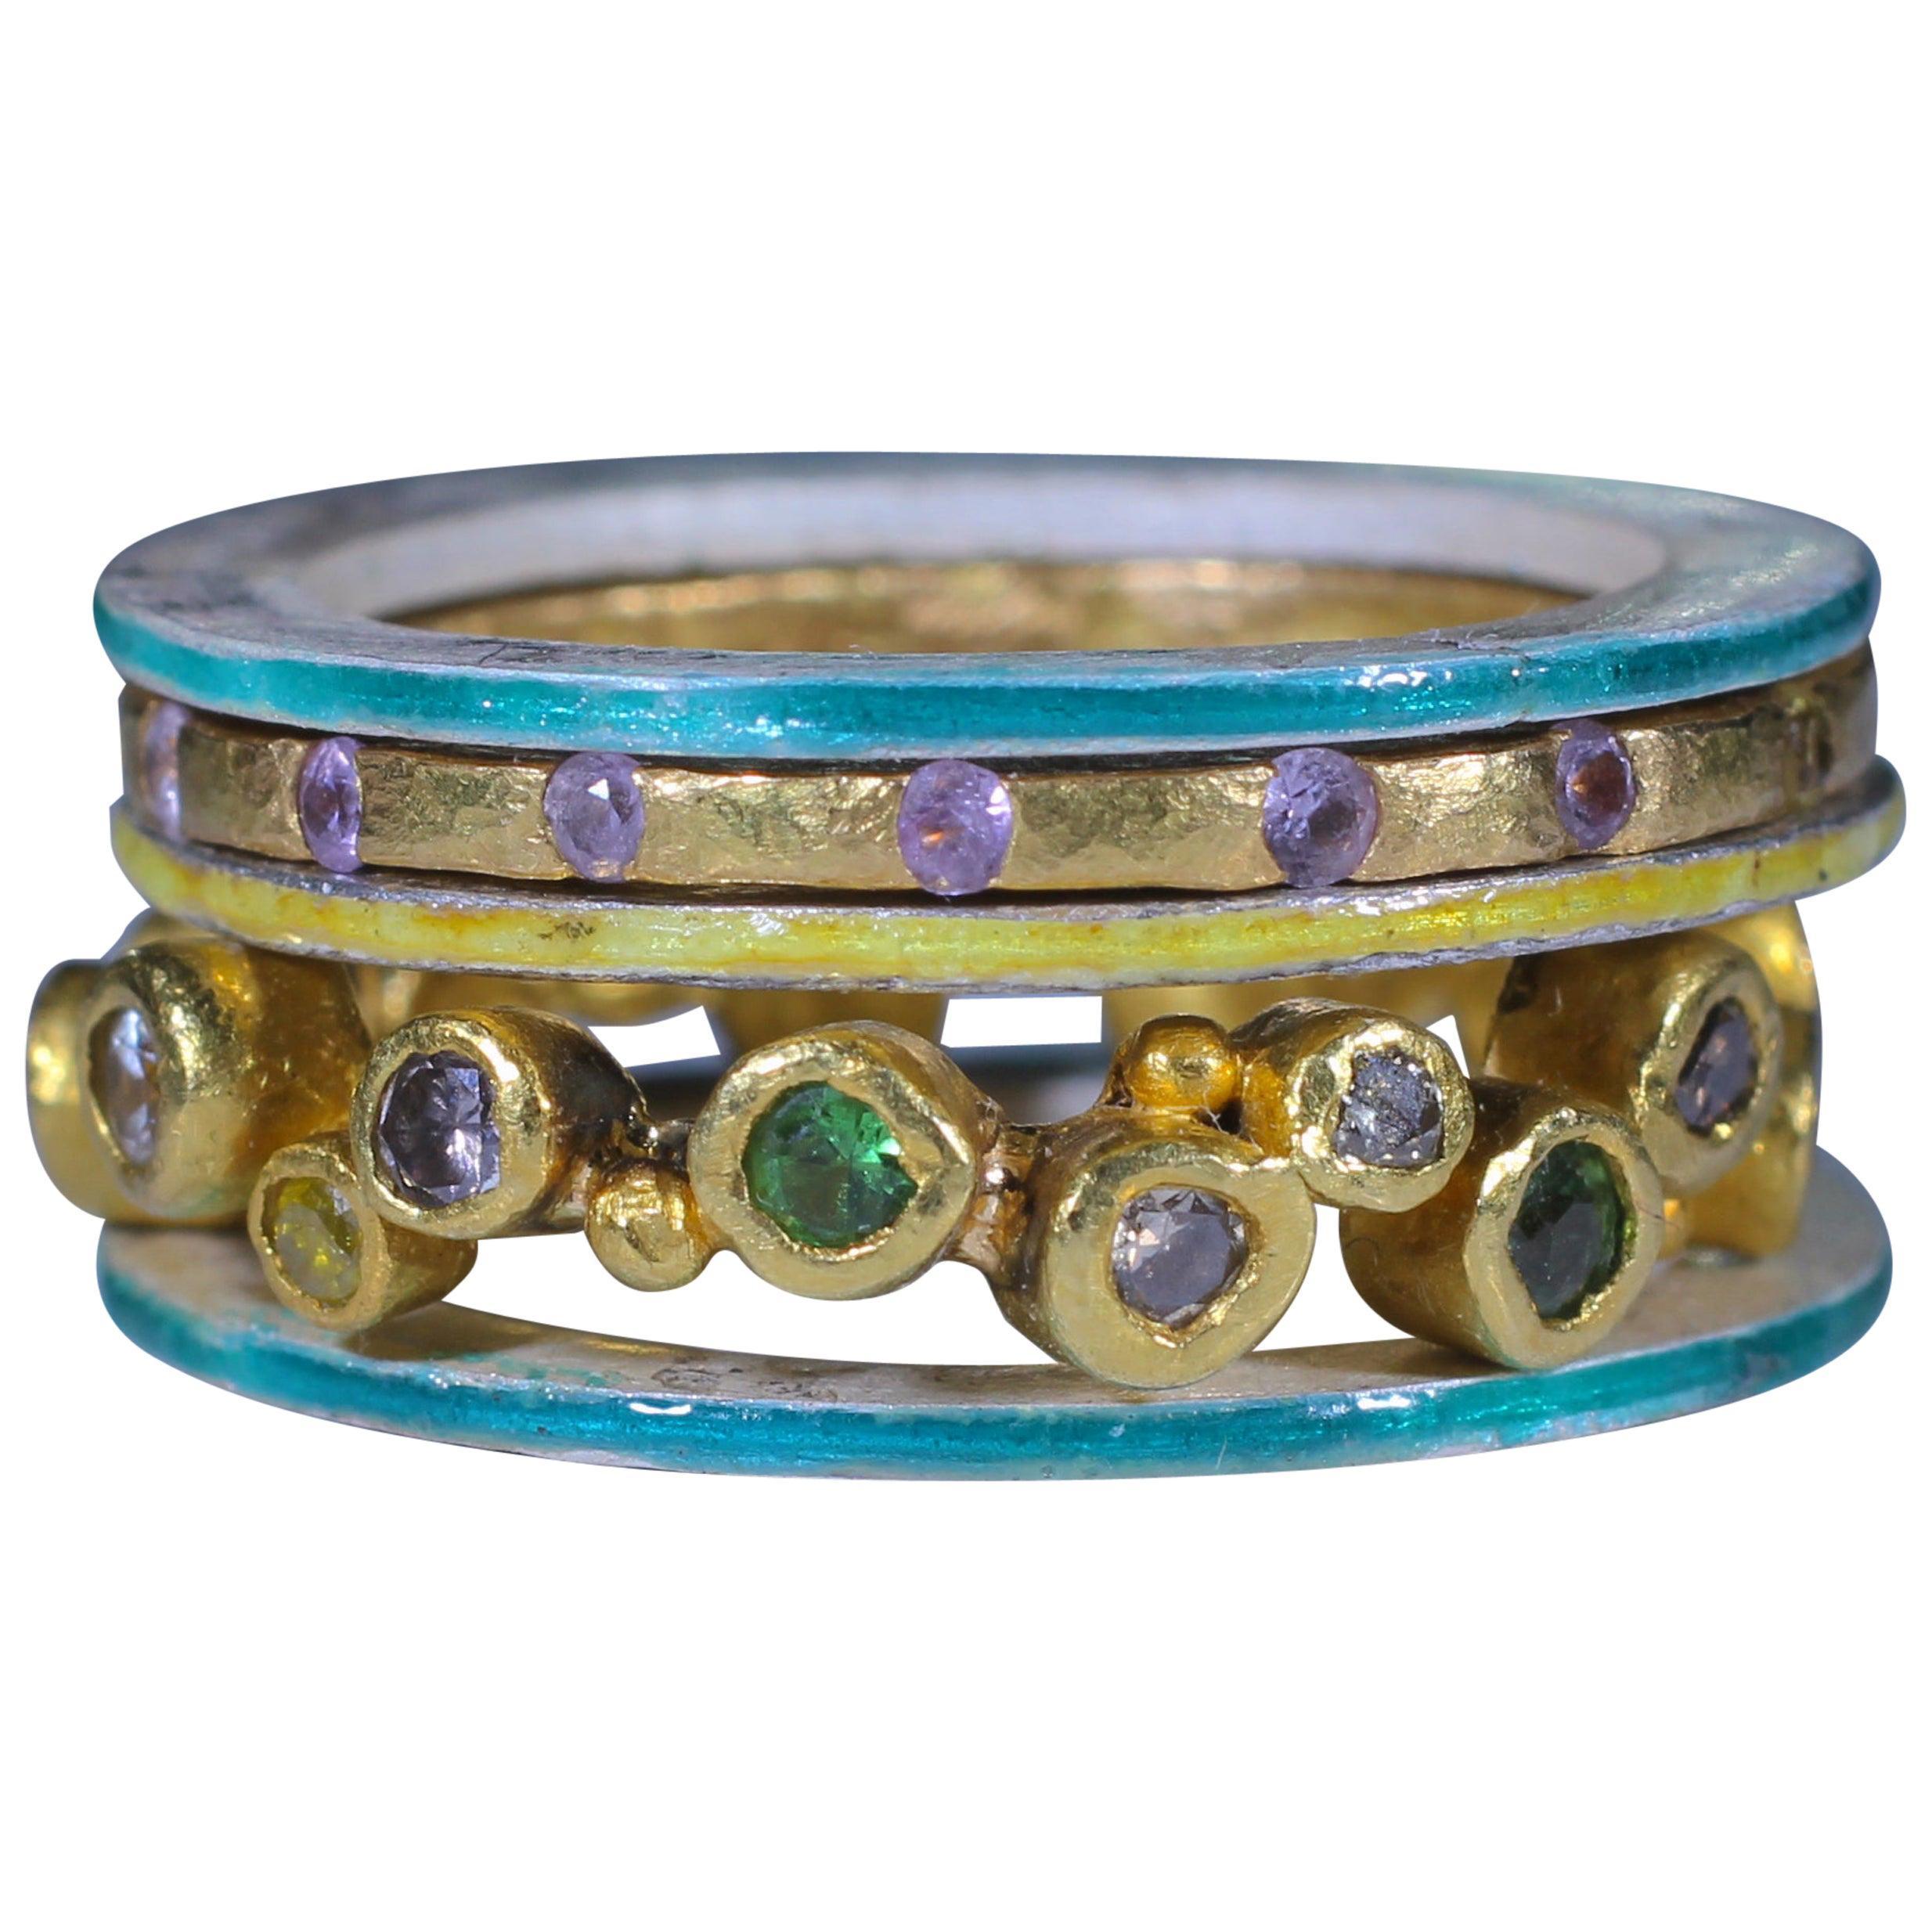 Diamond Sapphire Garnet 18K 22K Gold Silver Fashion Ring Wedding Gift for Mother